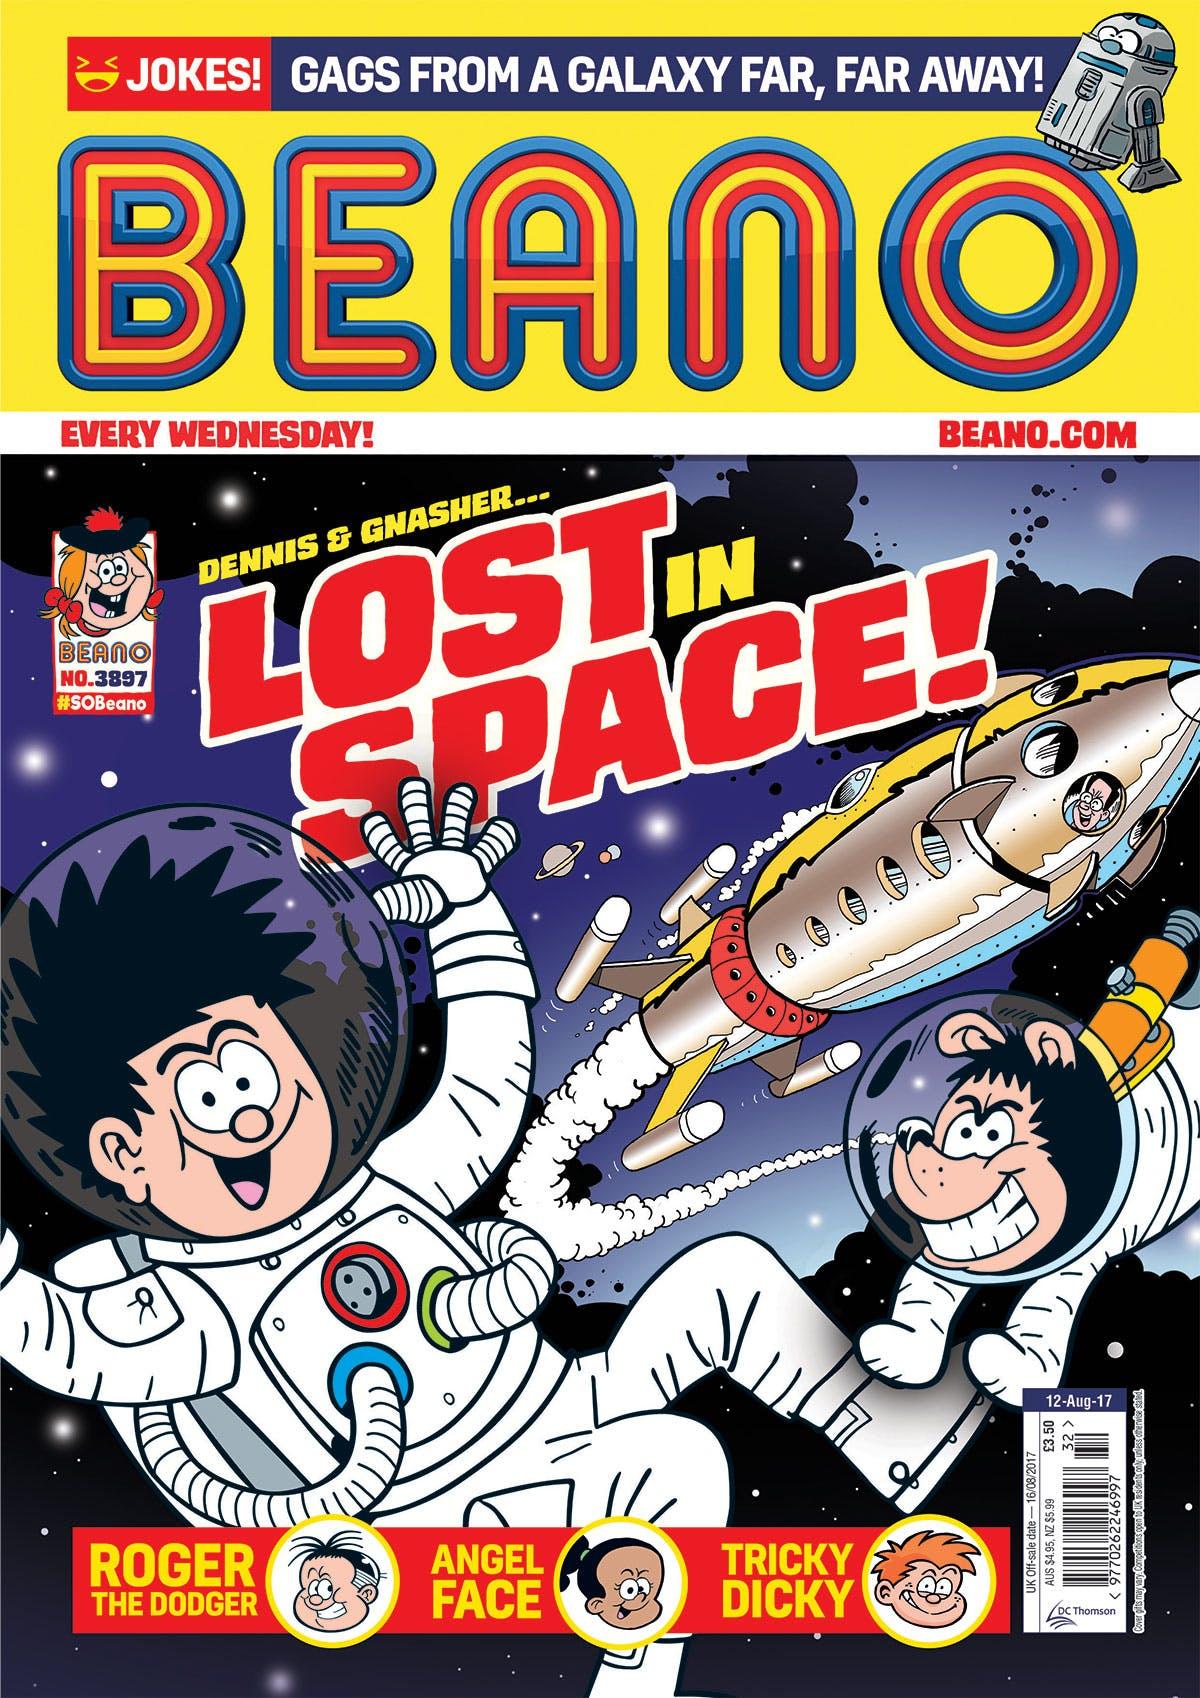 Beano No. 3897 - 12th August 2017